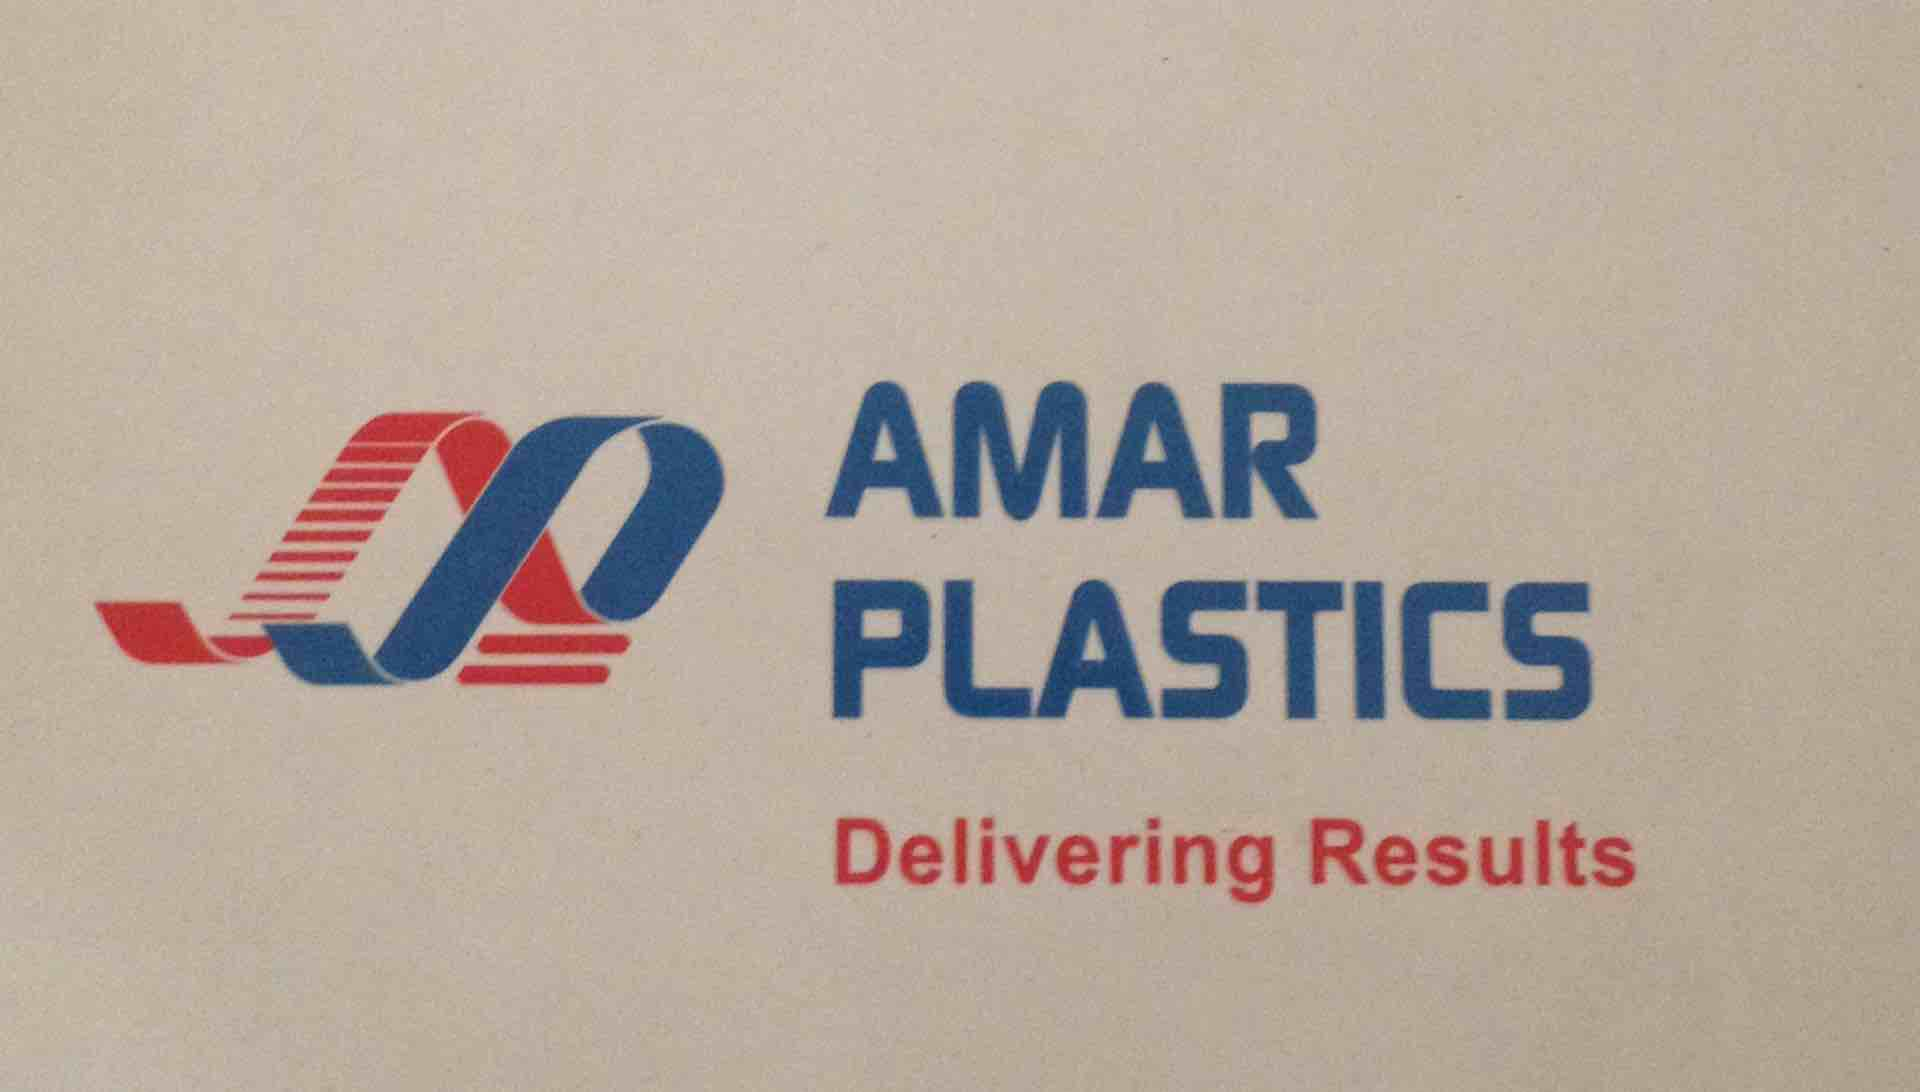 Amar Plastics